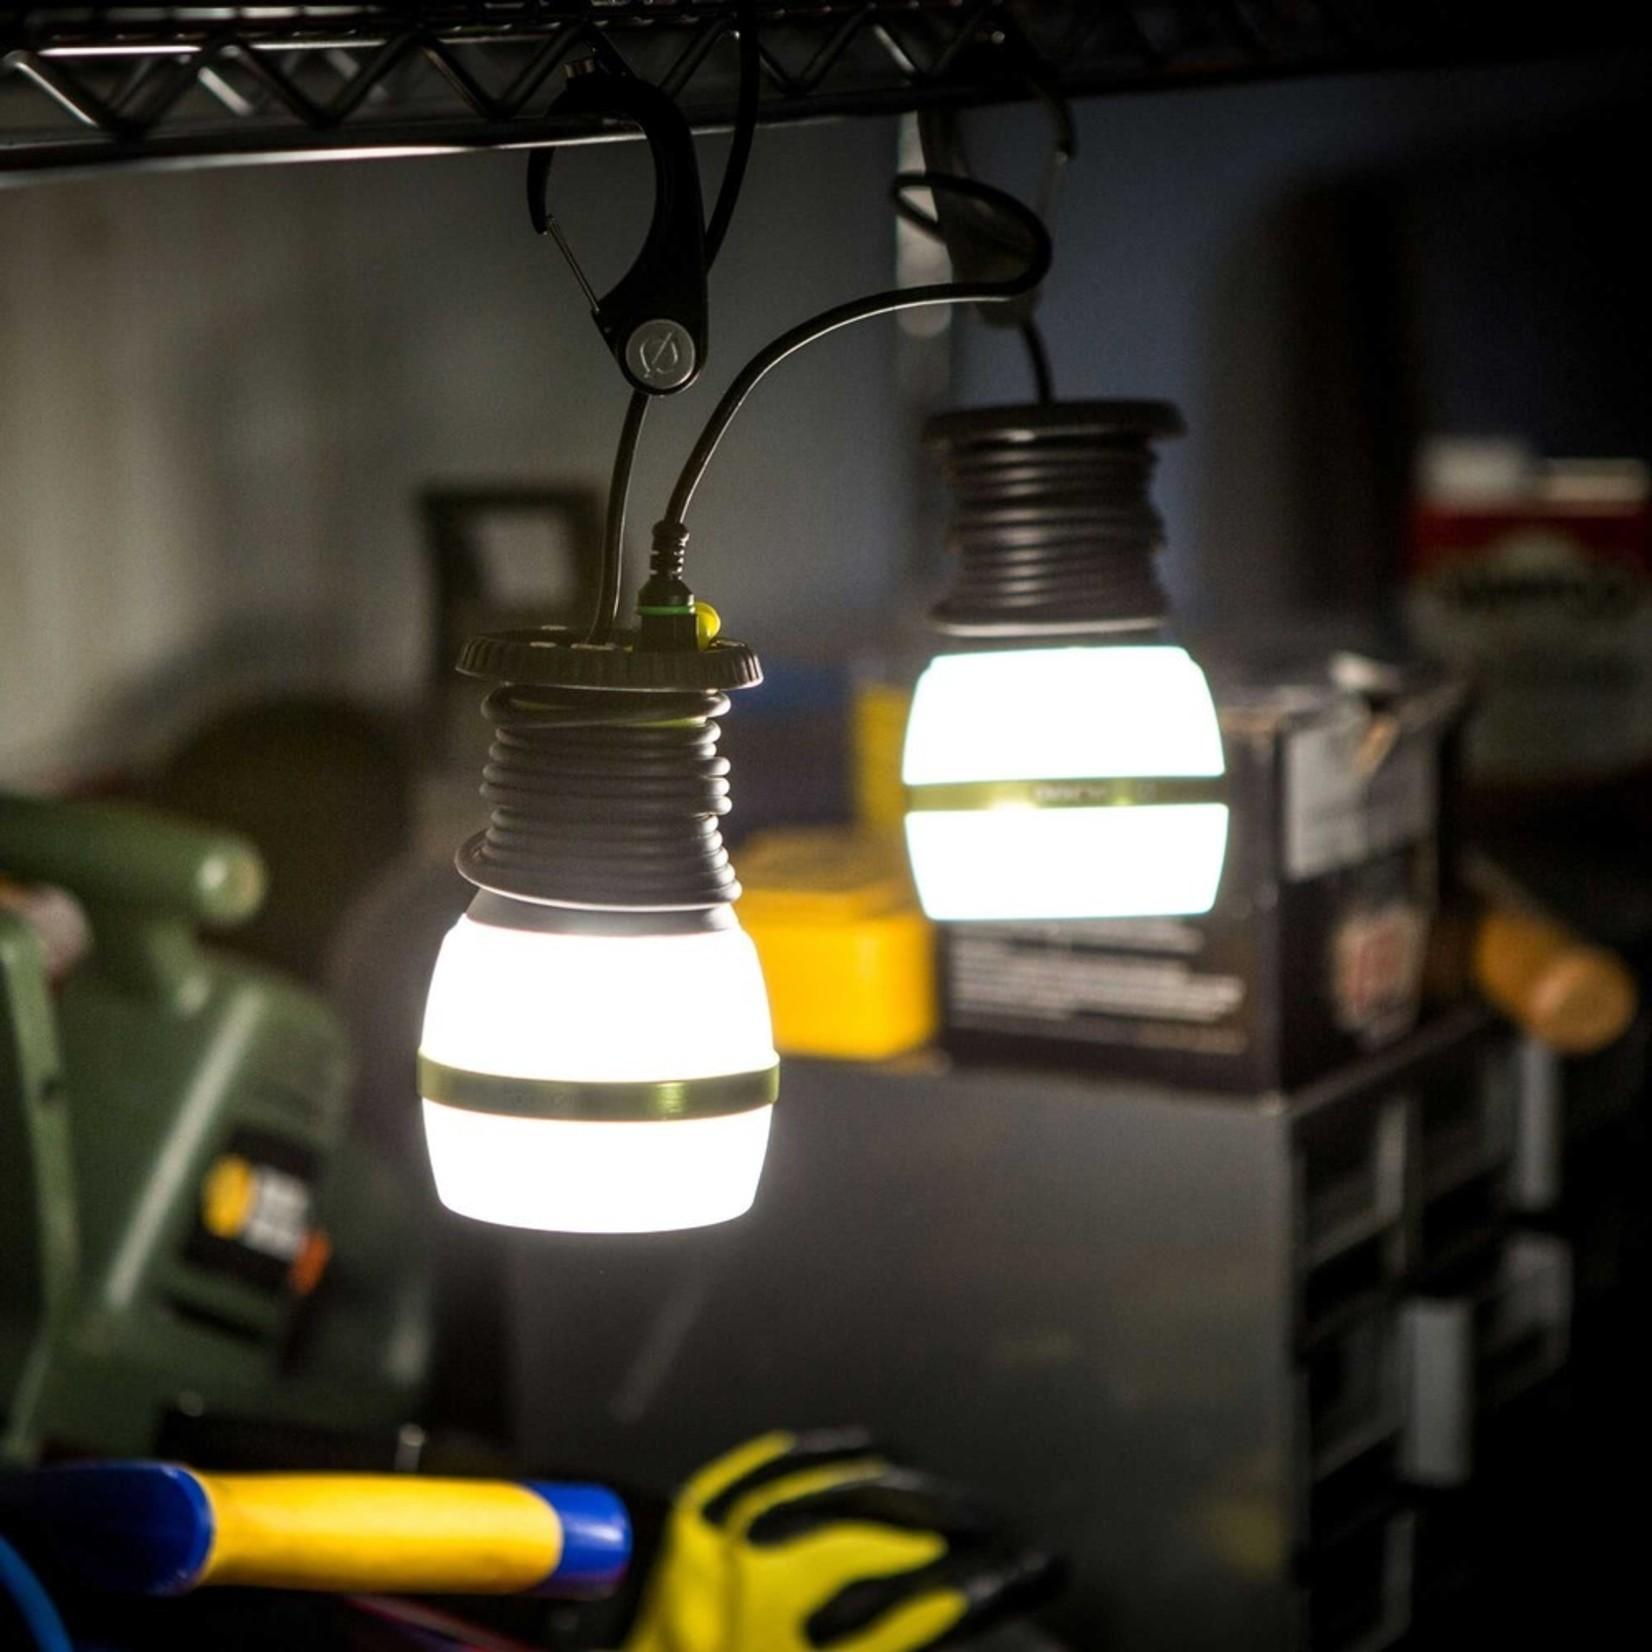 GOALZERO GOAL ZERO Light-A-Life 350 LED Light